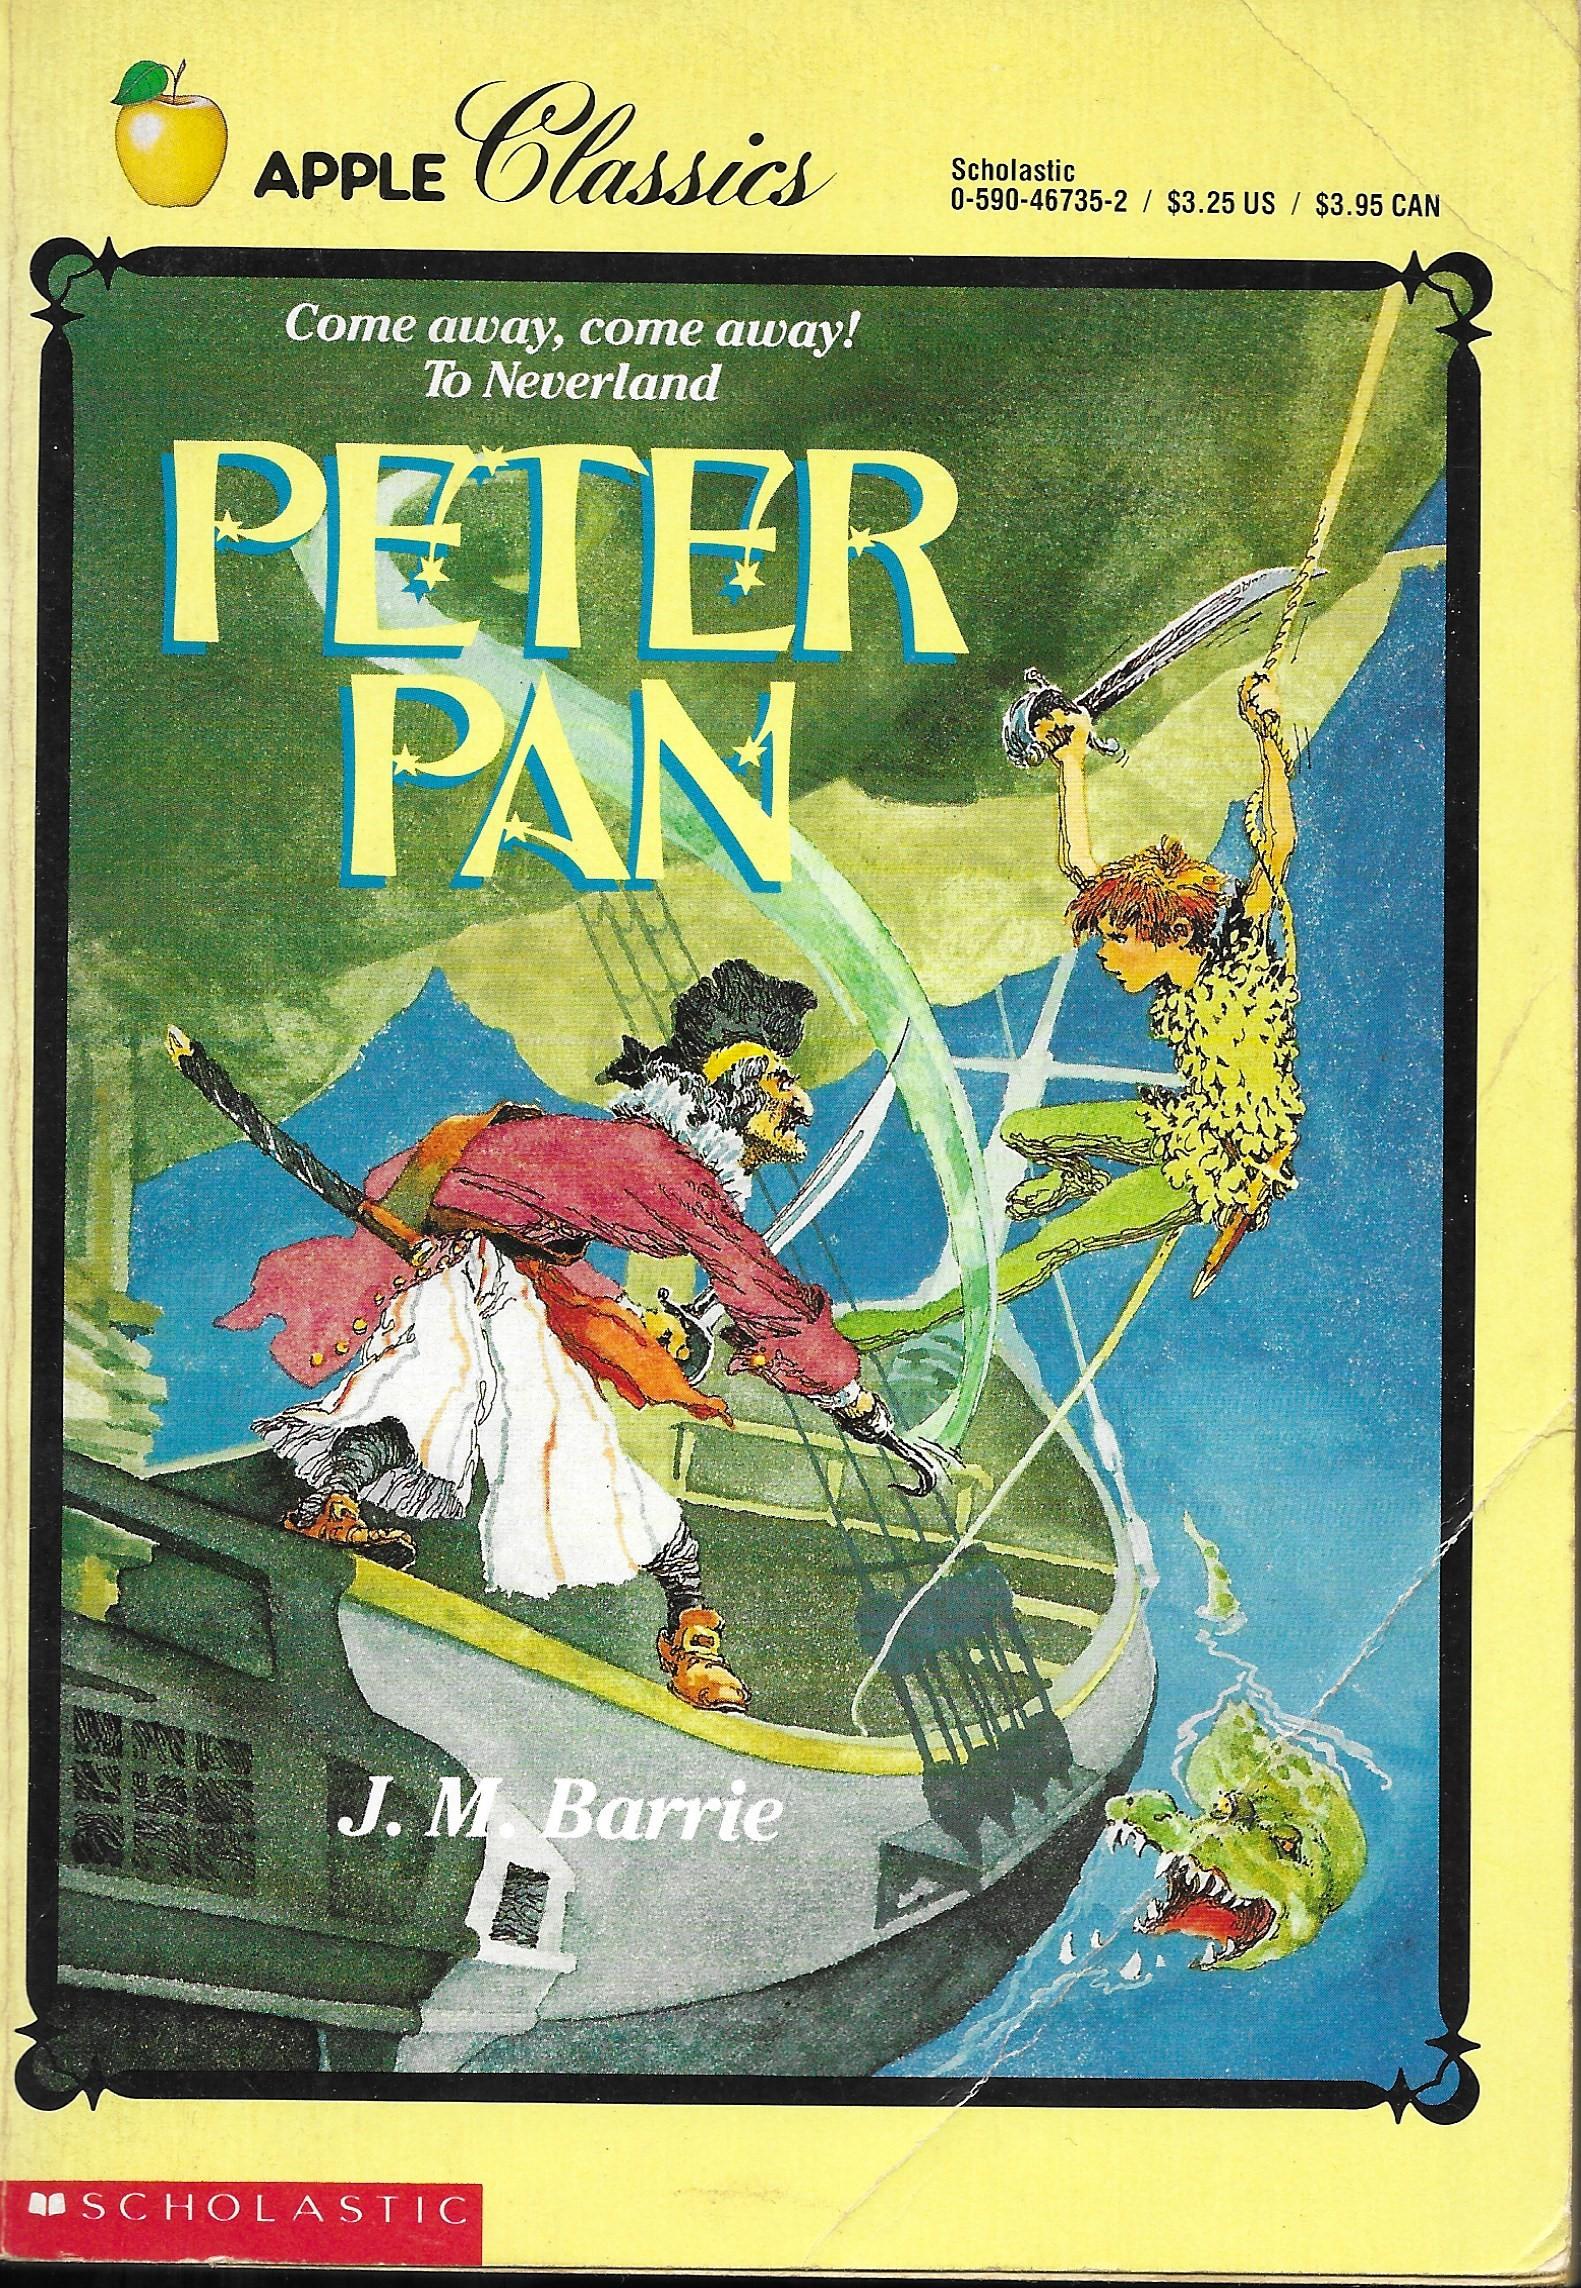 J.M BARRIE DEL PRADO MINIATURE BOOK CLASSICS THE ADVENTURES OF PETER PAN